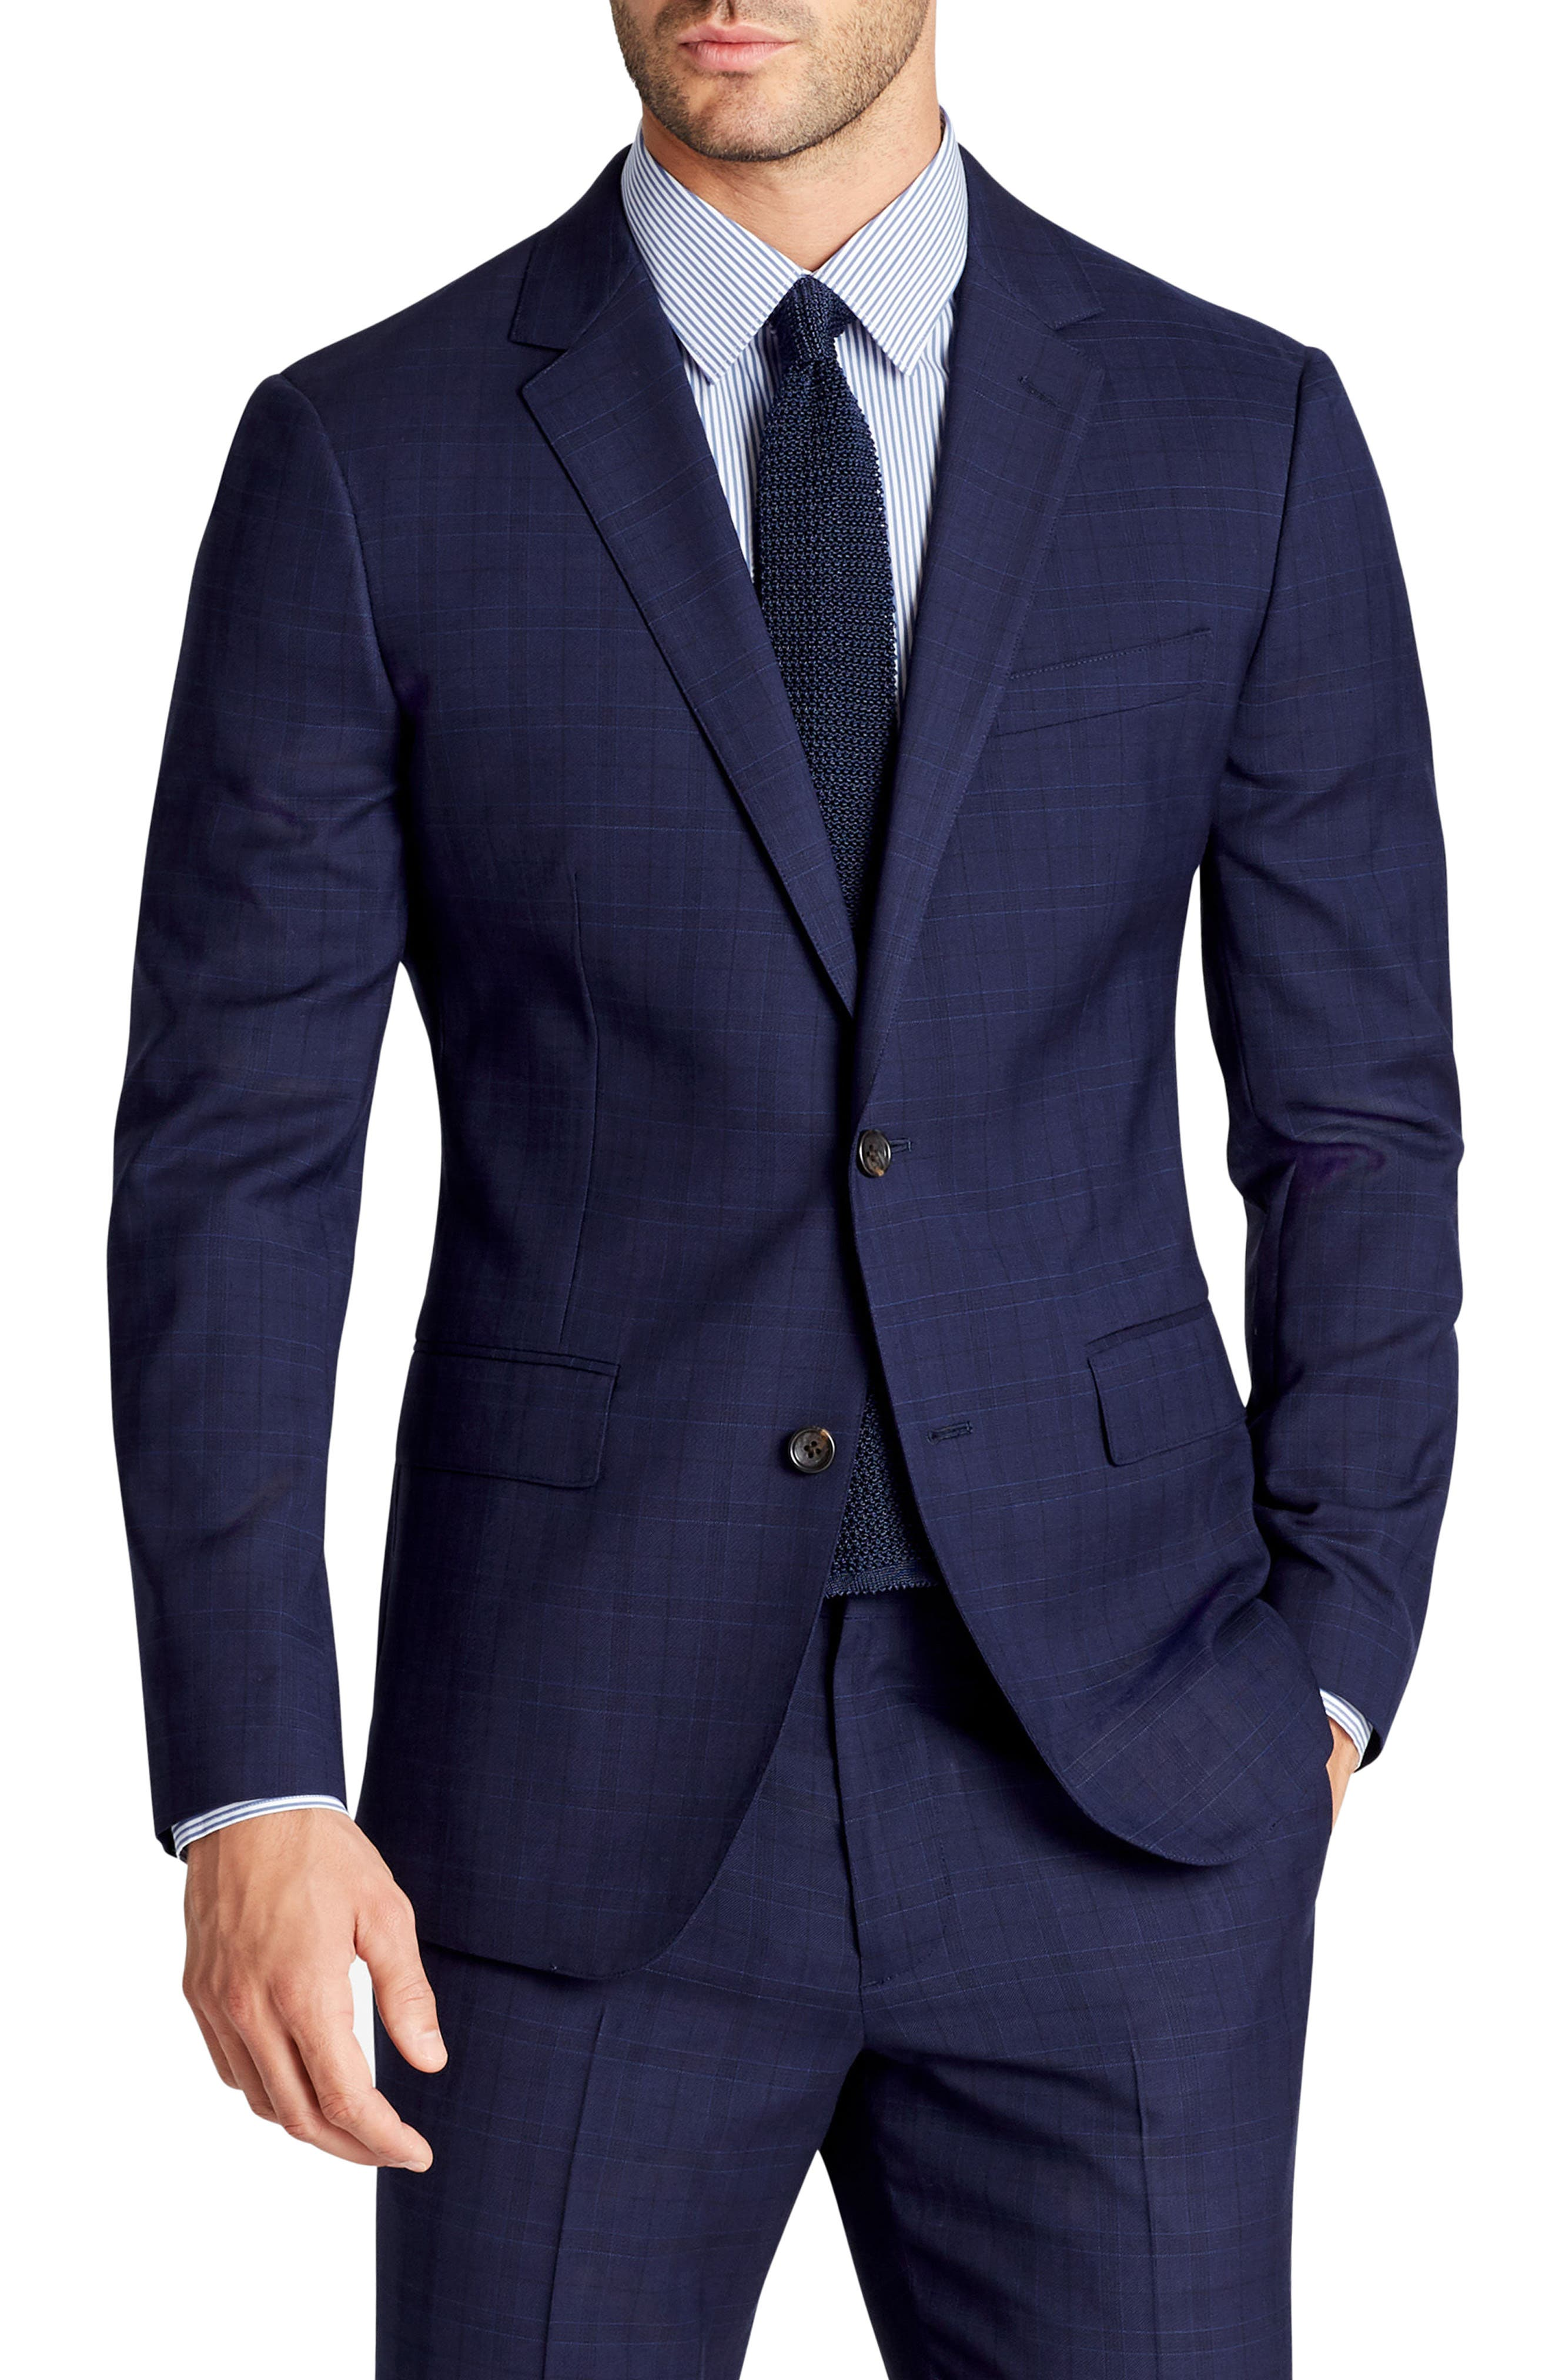 Jetsetter Slim Fit Plaid Stretch Wool Sport Coat,                         Main,                         color, 400